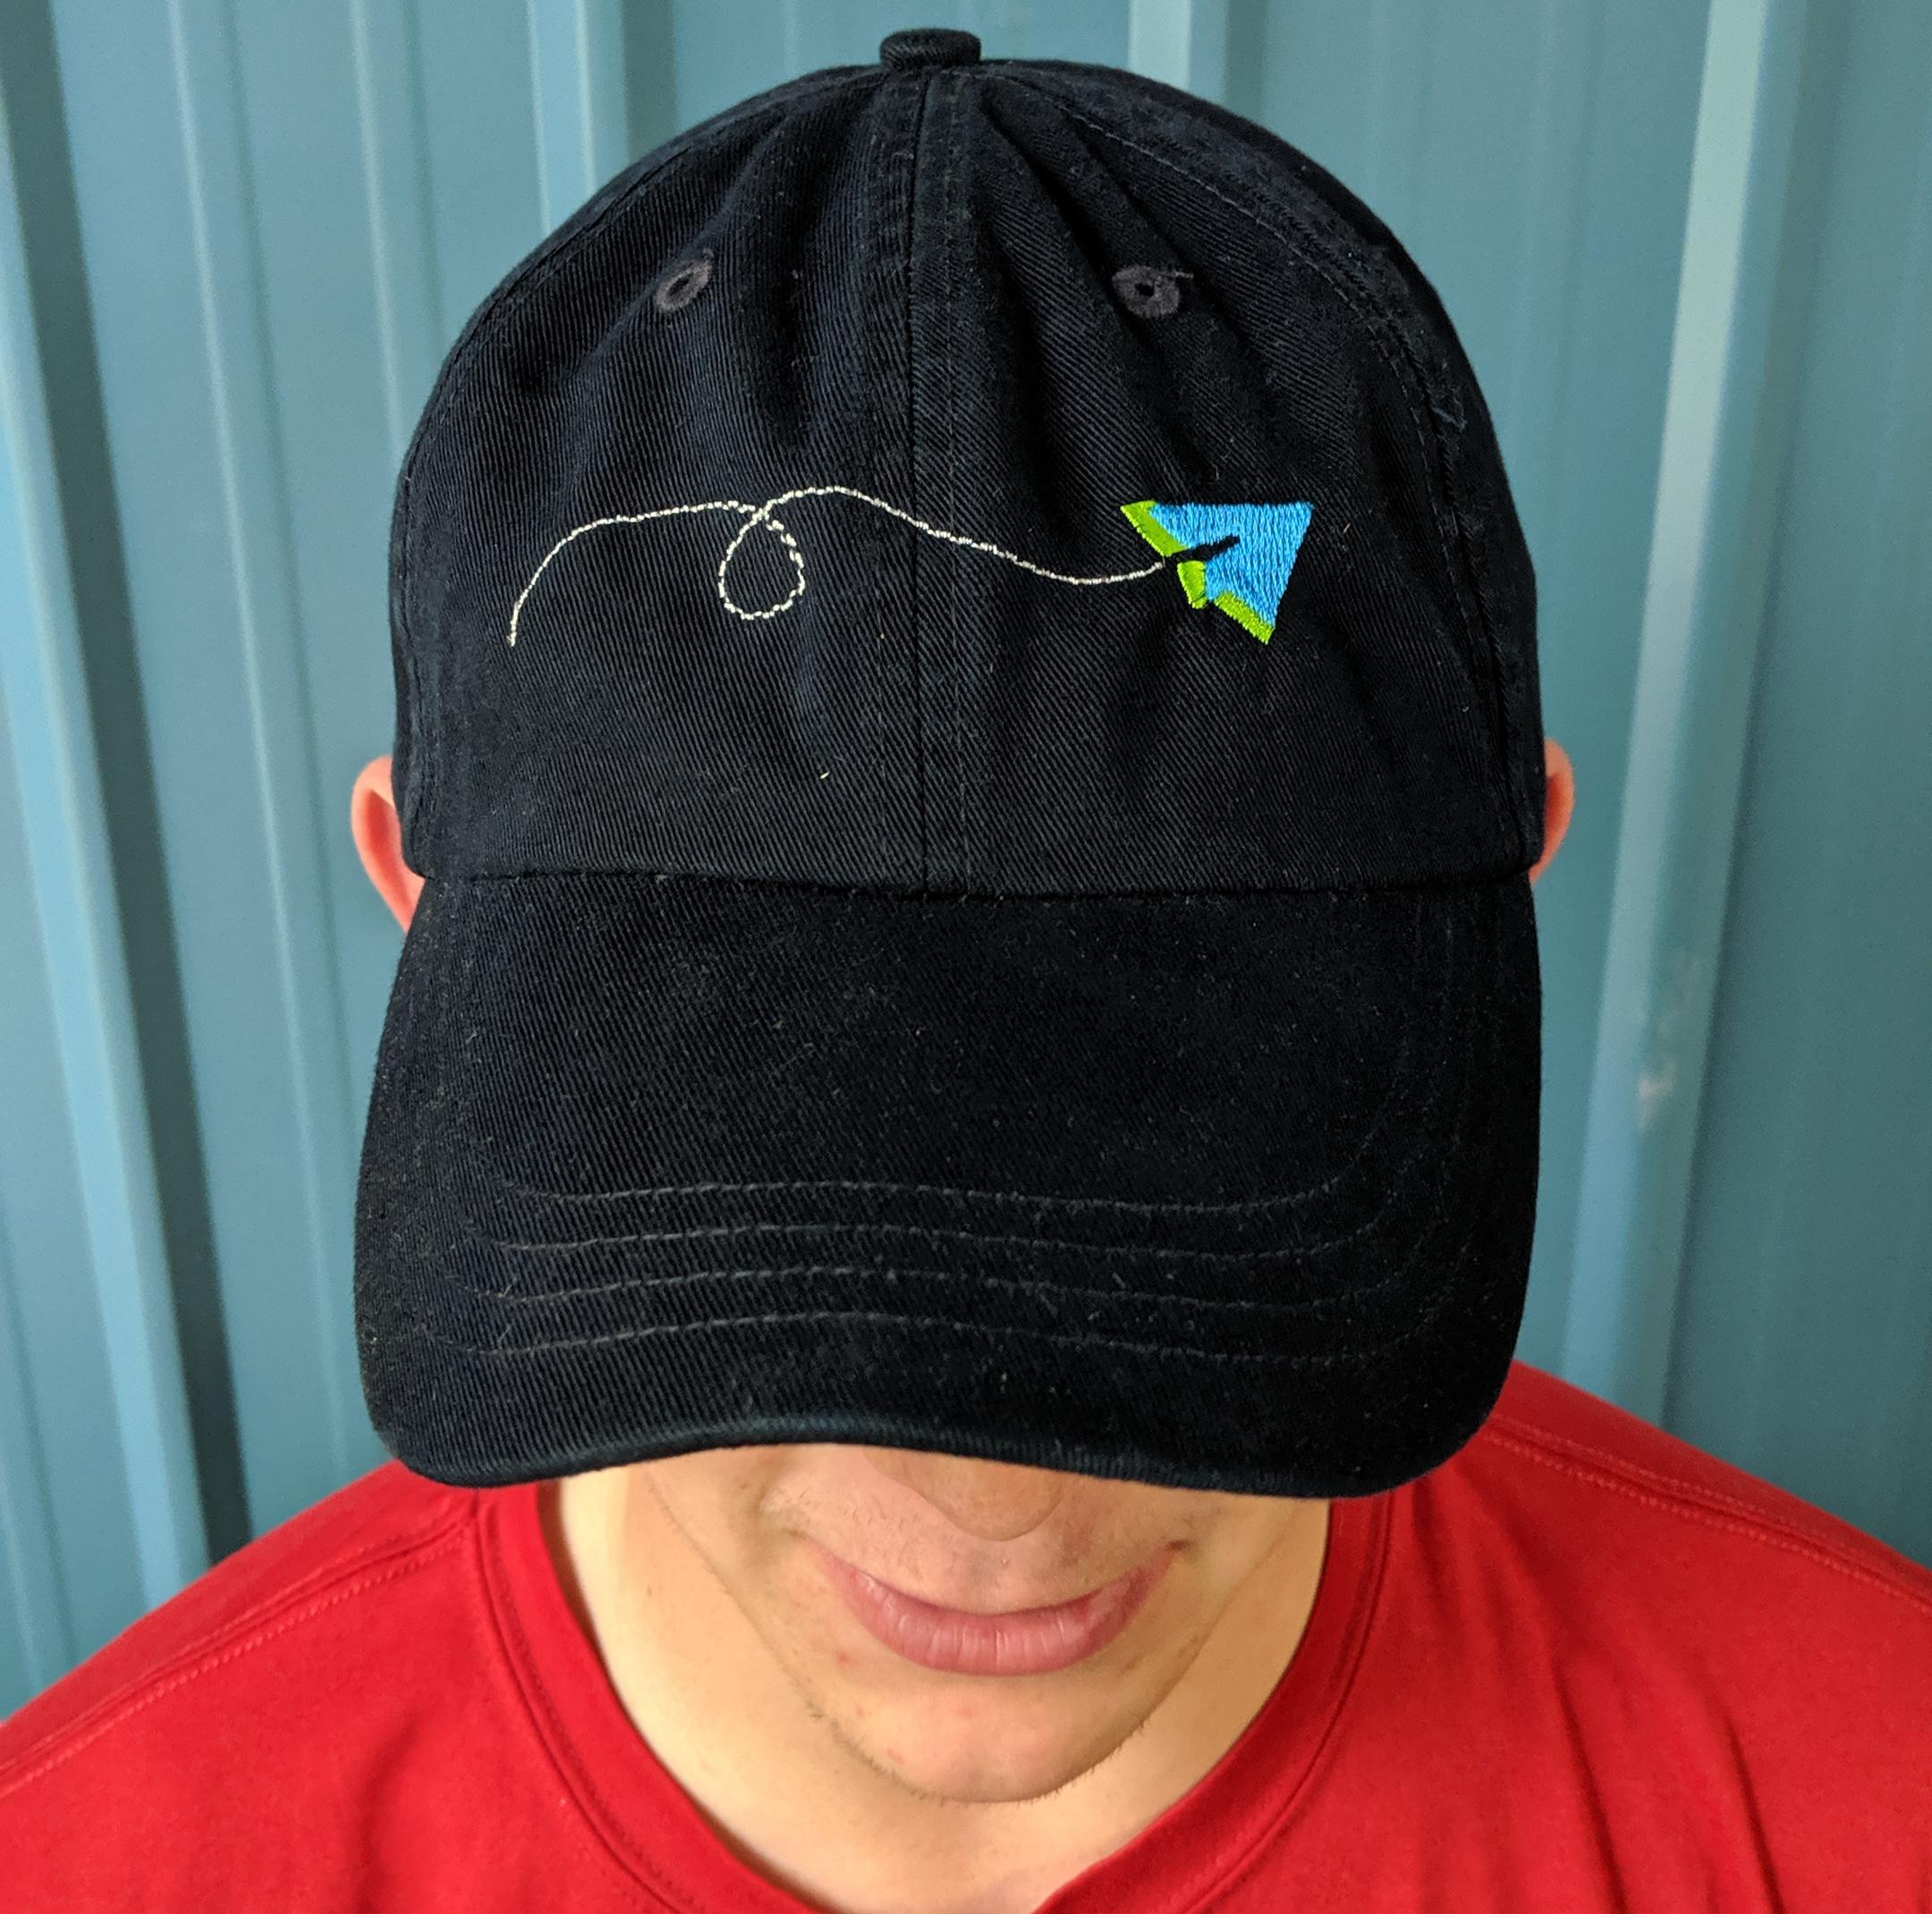 Hat shop navy